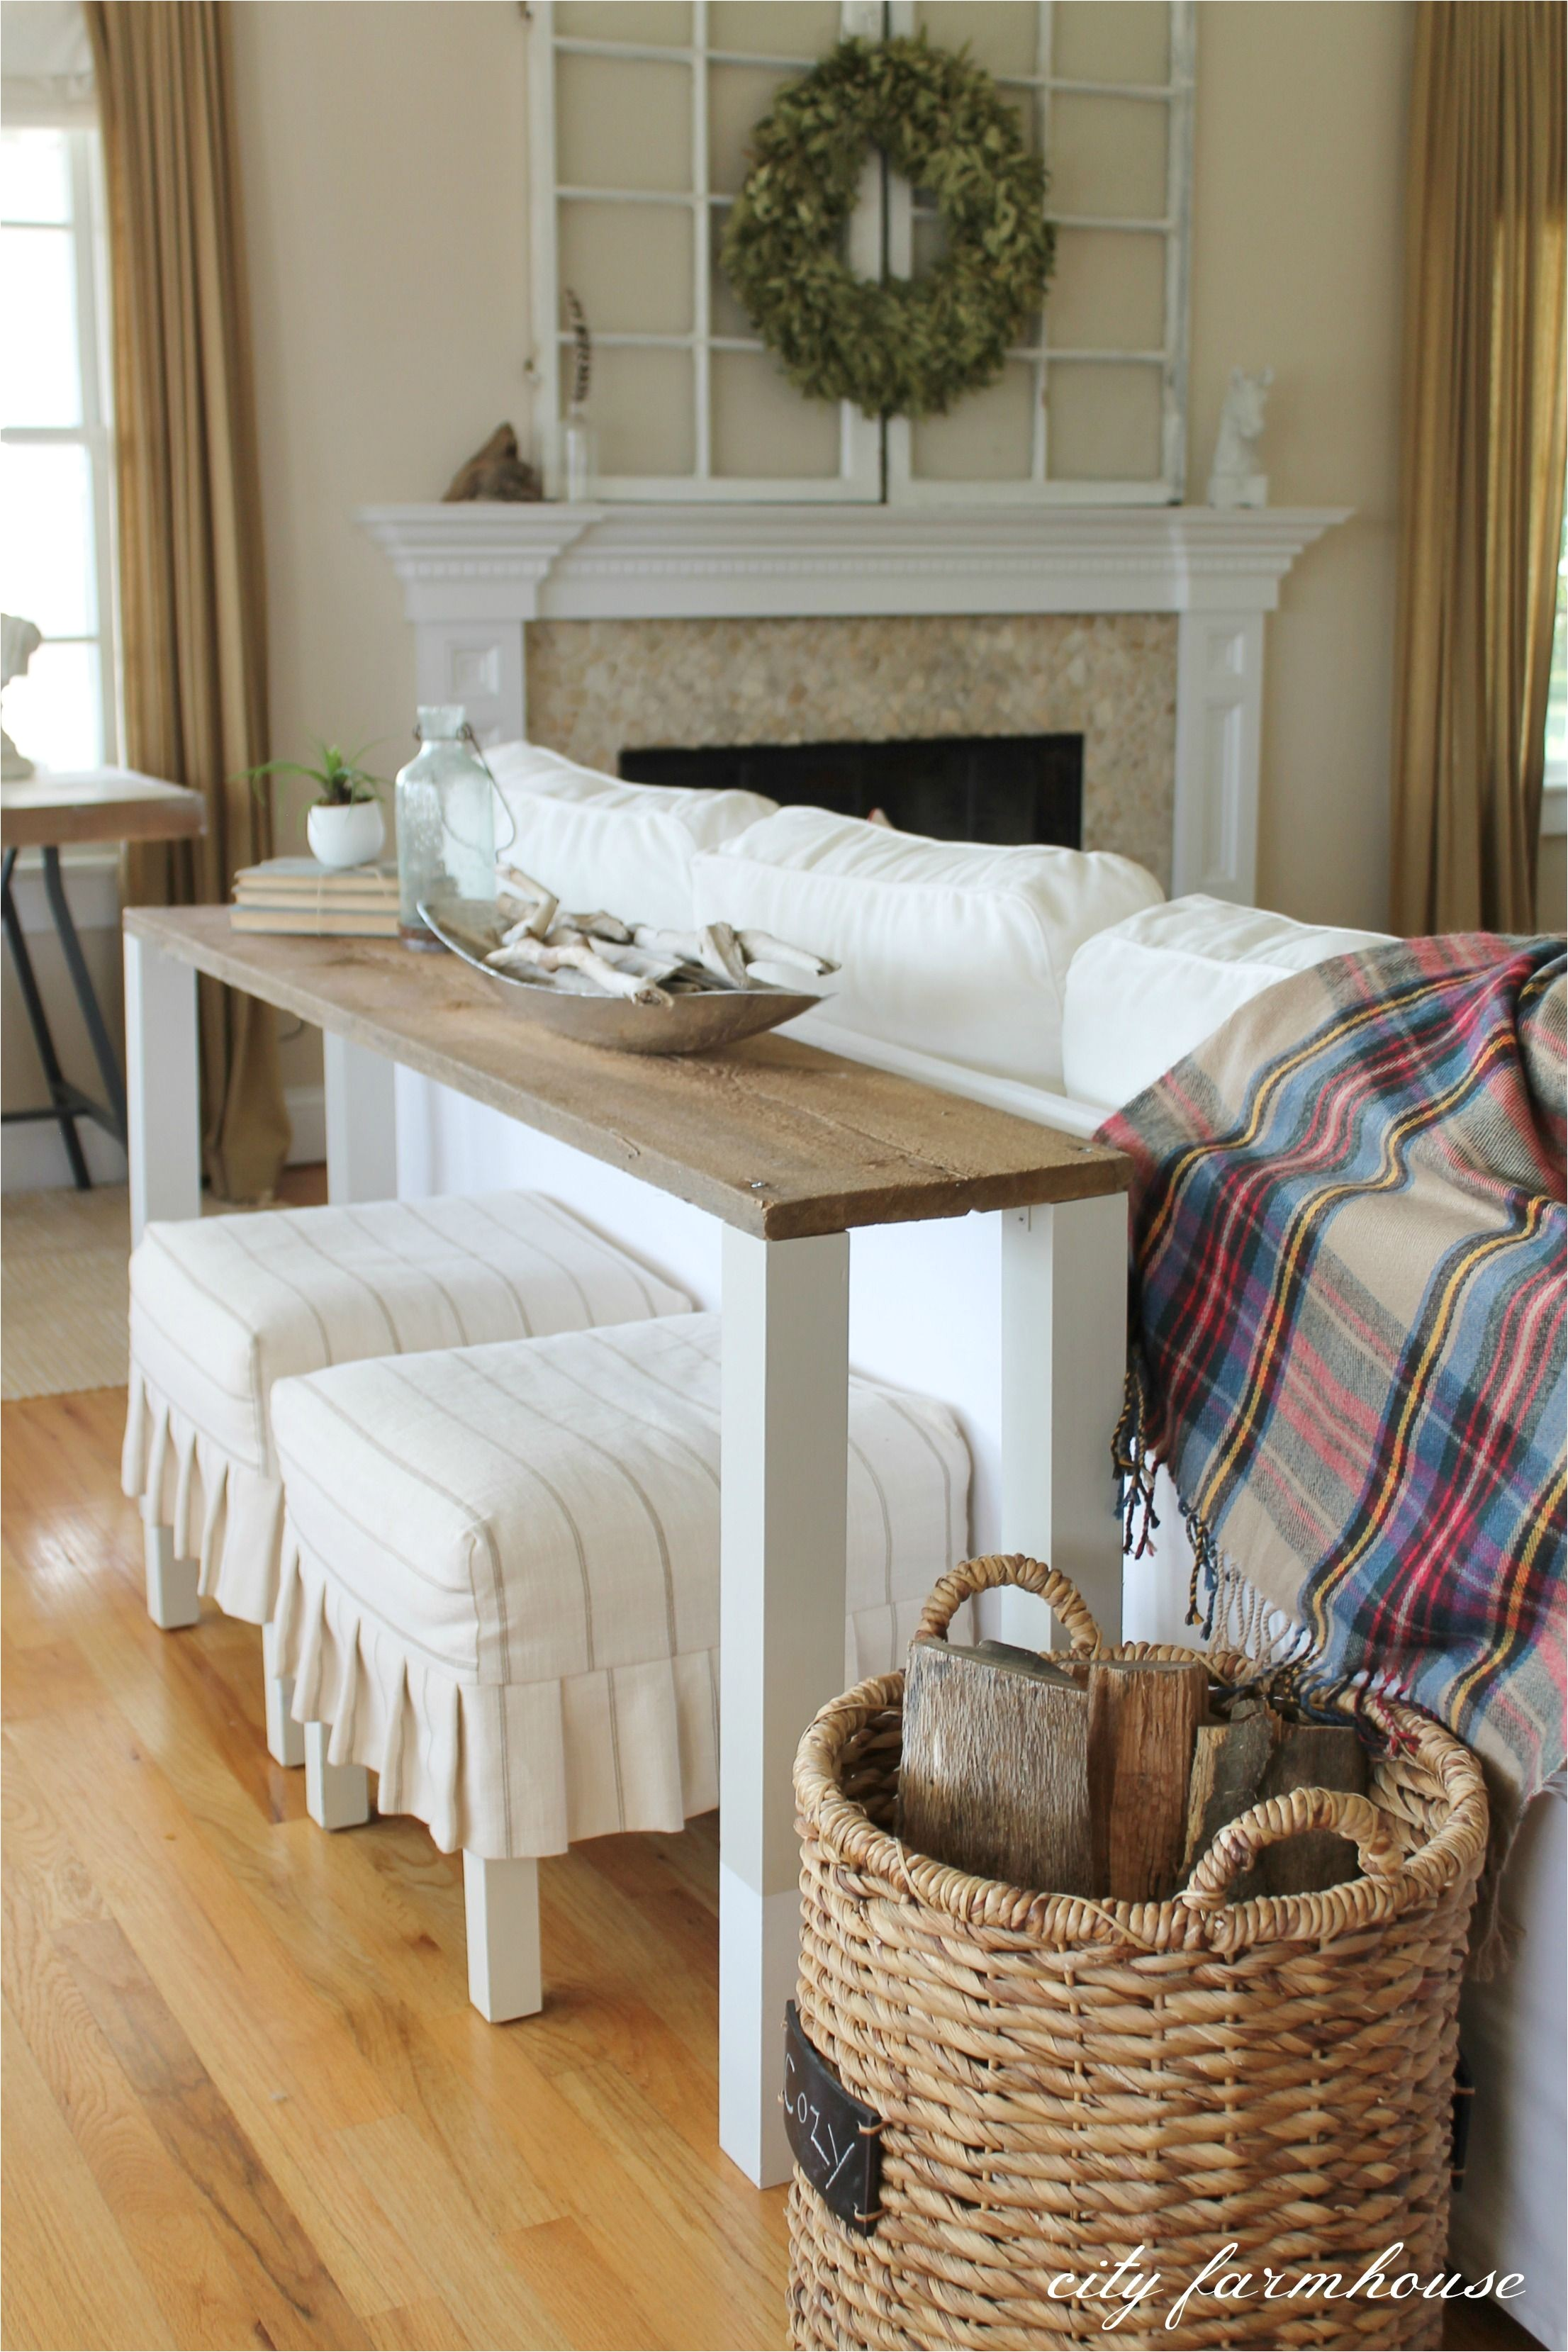 6 Foot Wide sofa Table the Easiest Diy Reclaimed Wood sofa Table Pinterest Diy sofa